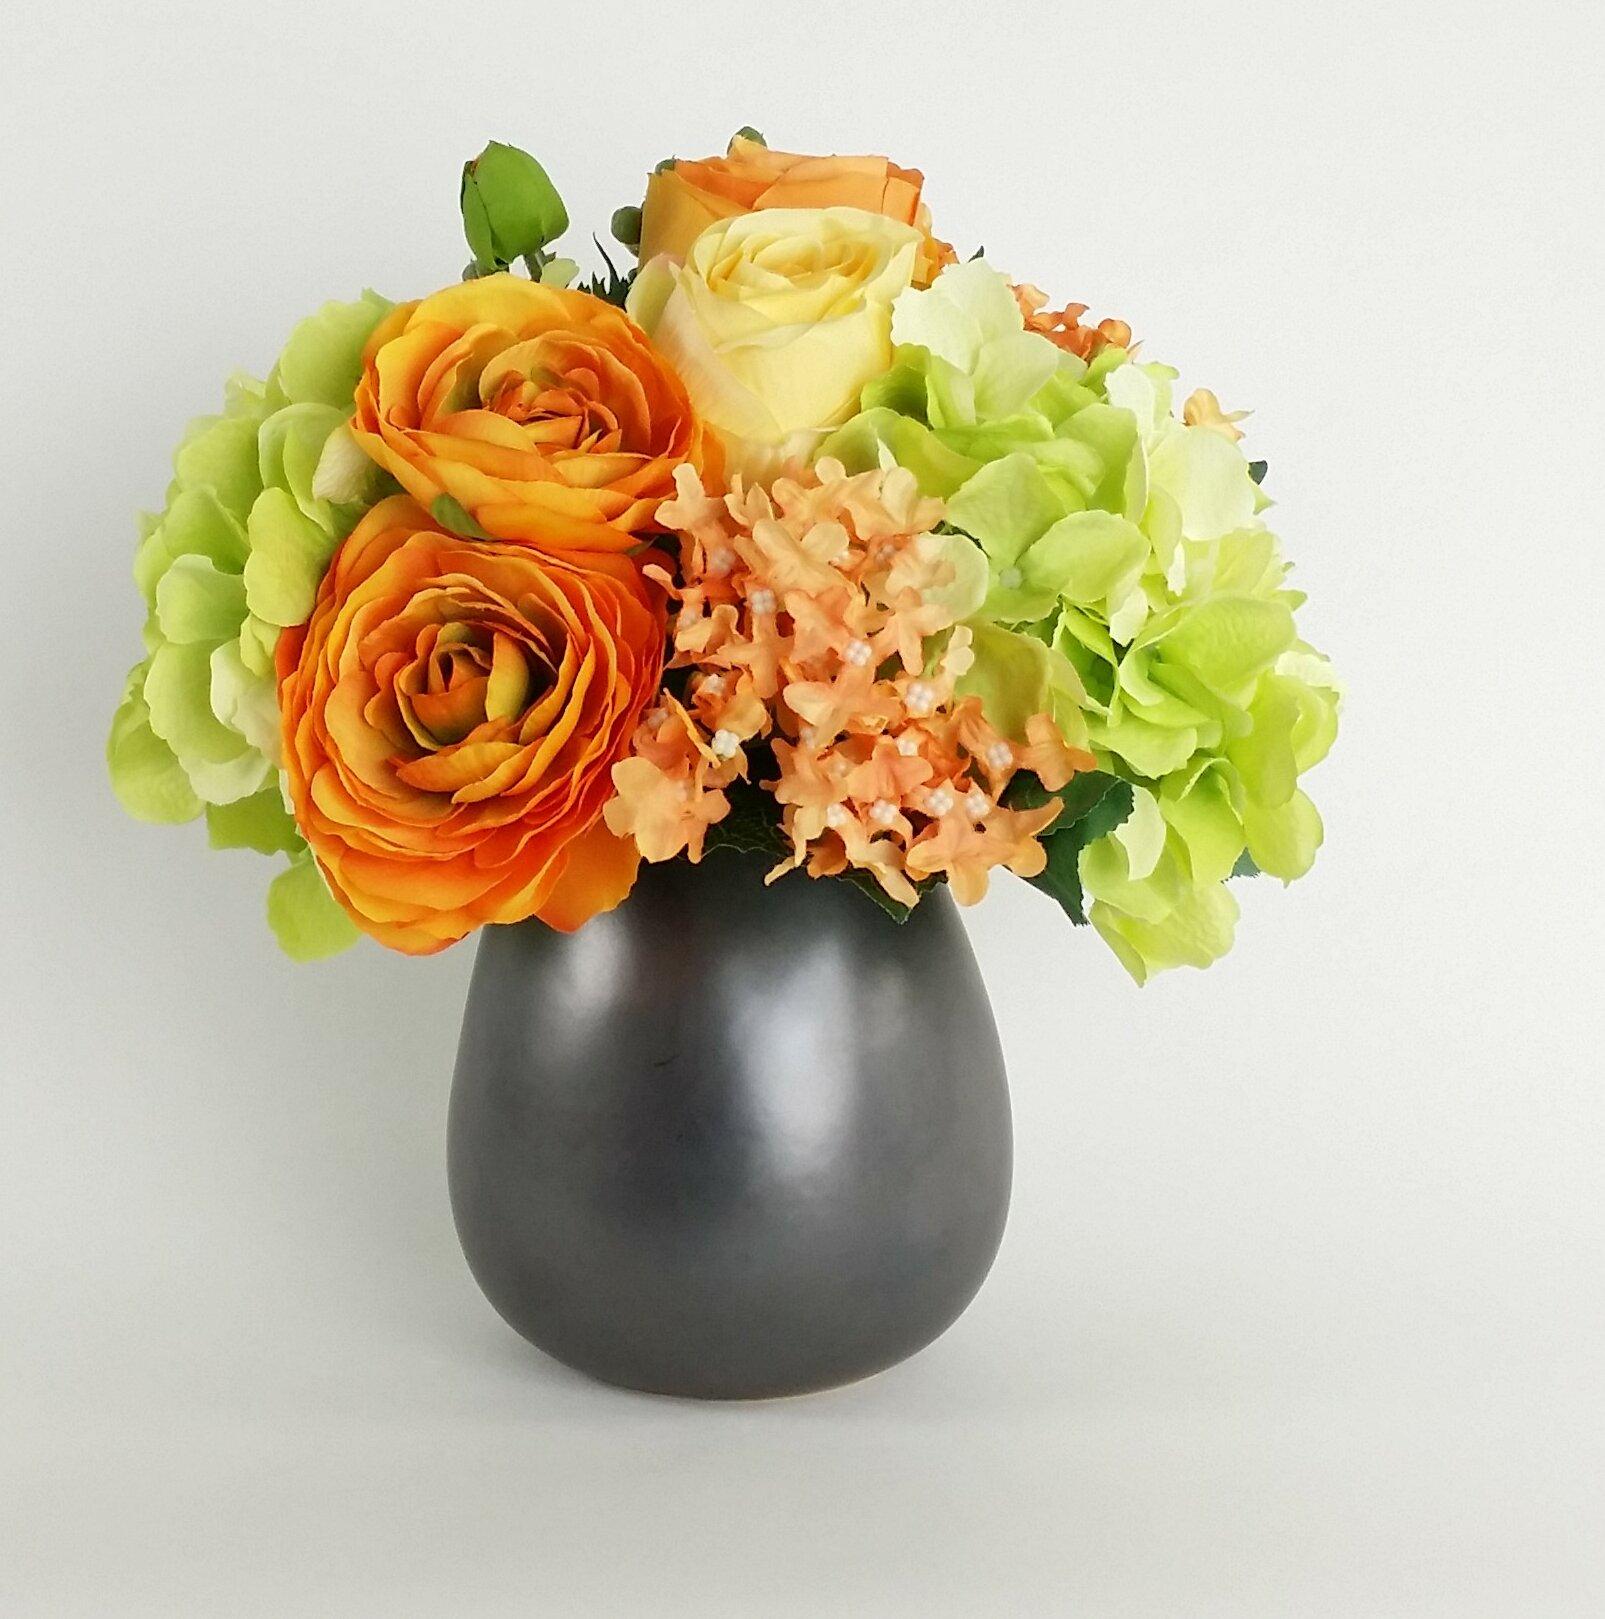 Rg Style Artificial Silk Mixed Floral Arrangements In Decorative Vase Wayfair